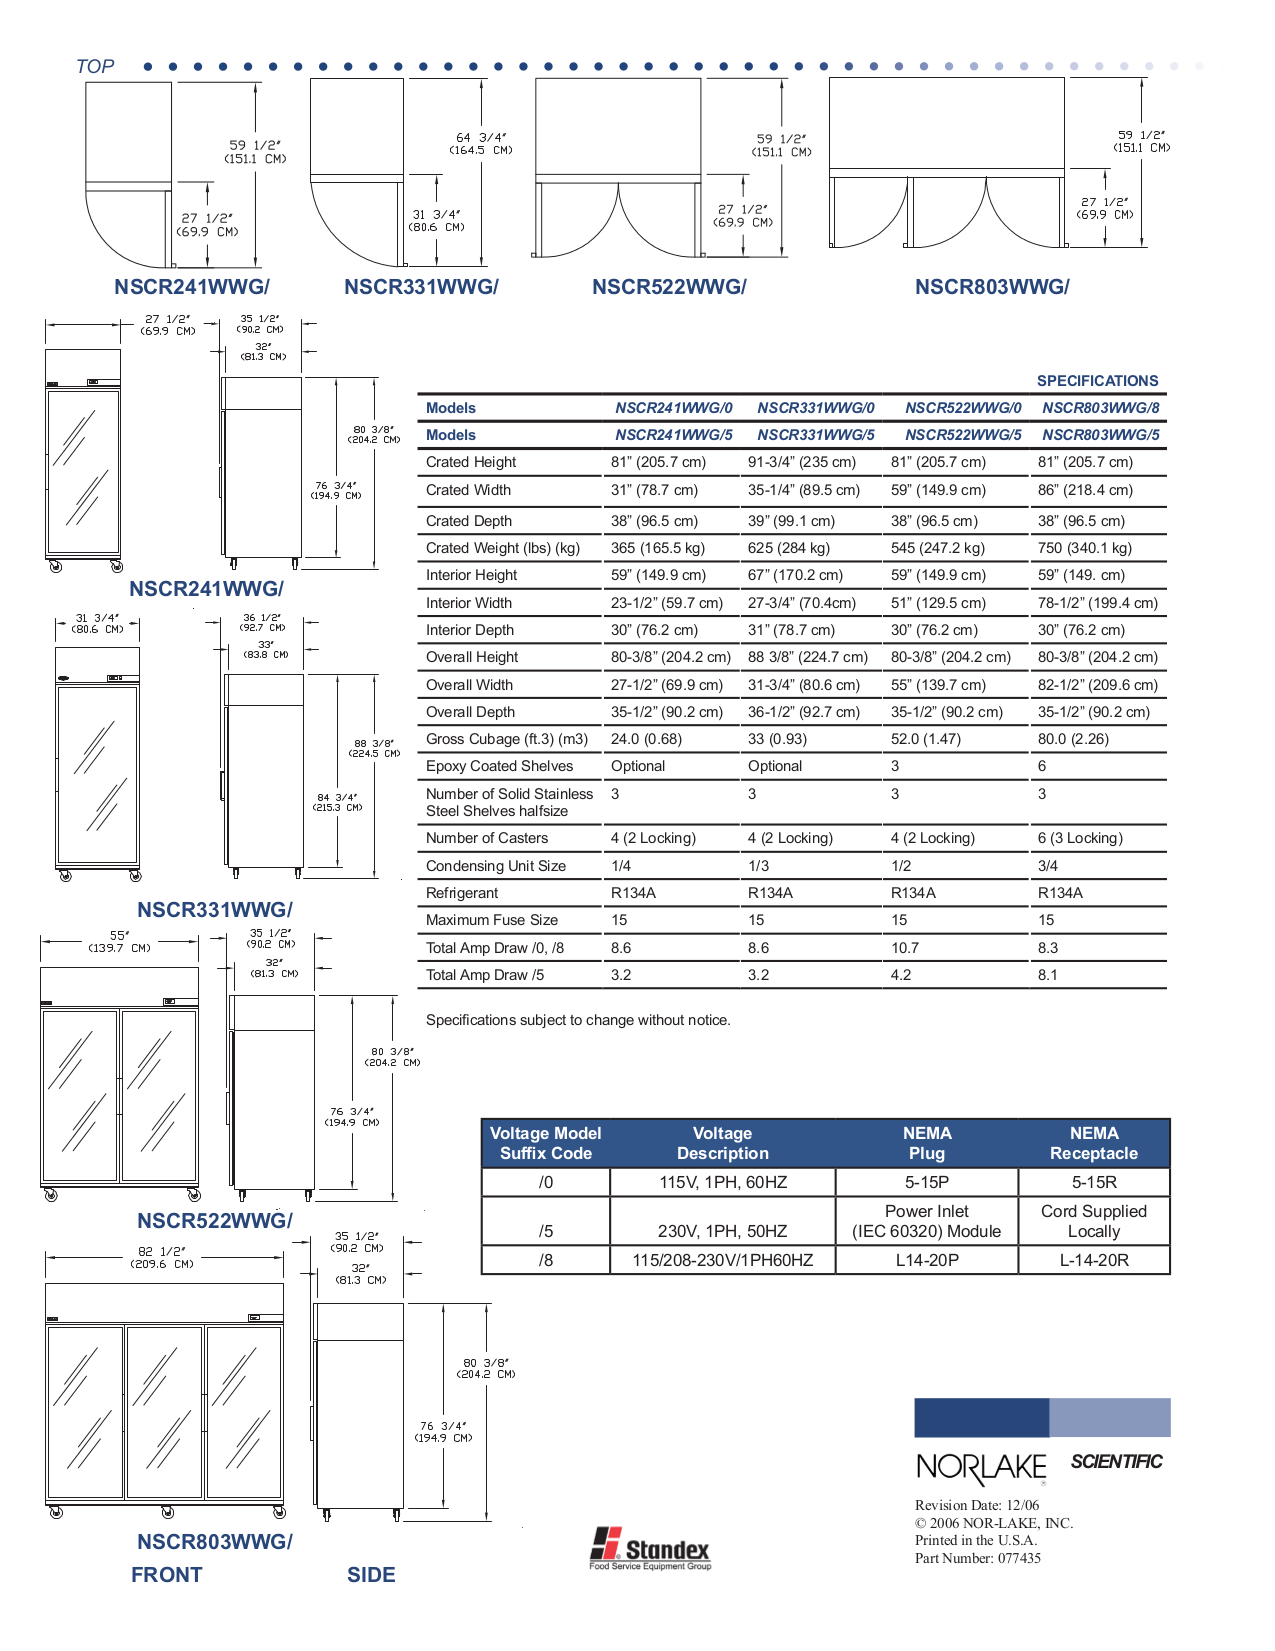 pdf for Norlake Refrigerator NSCR522WWG manual